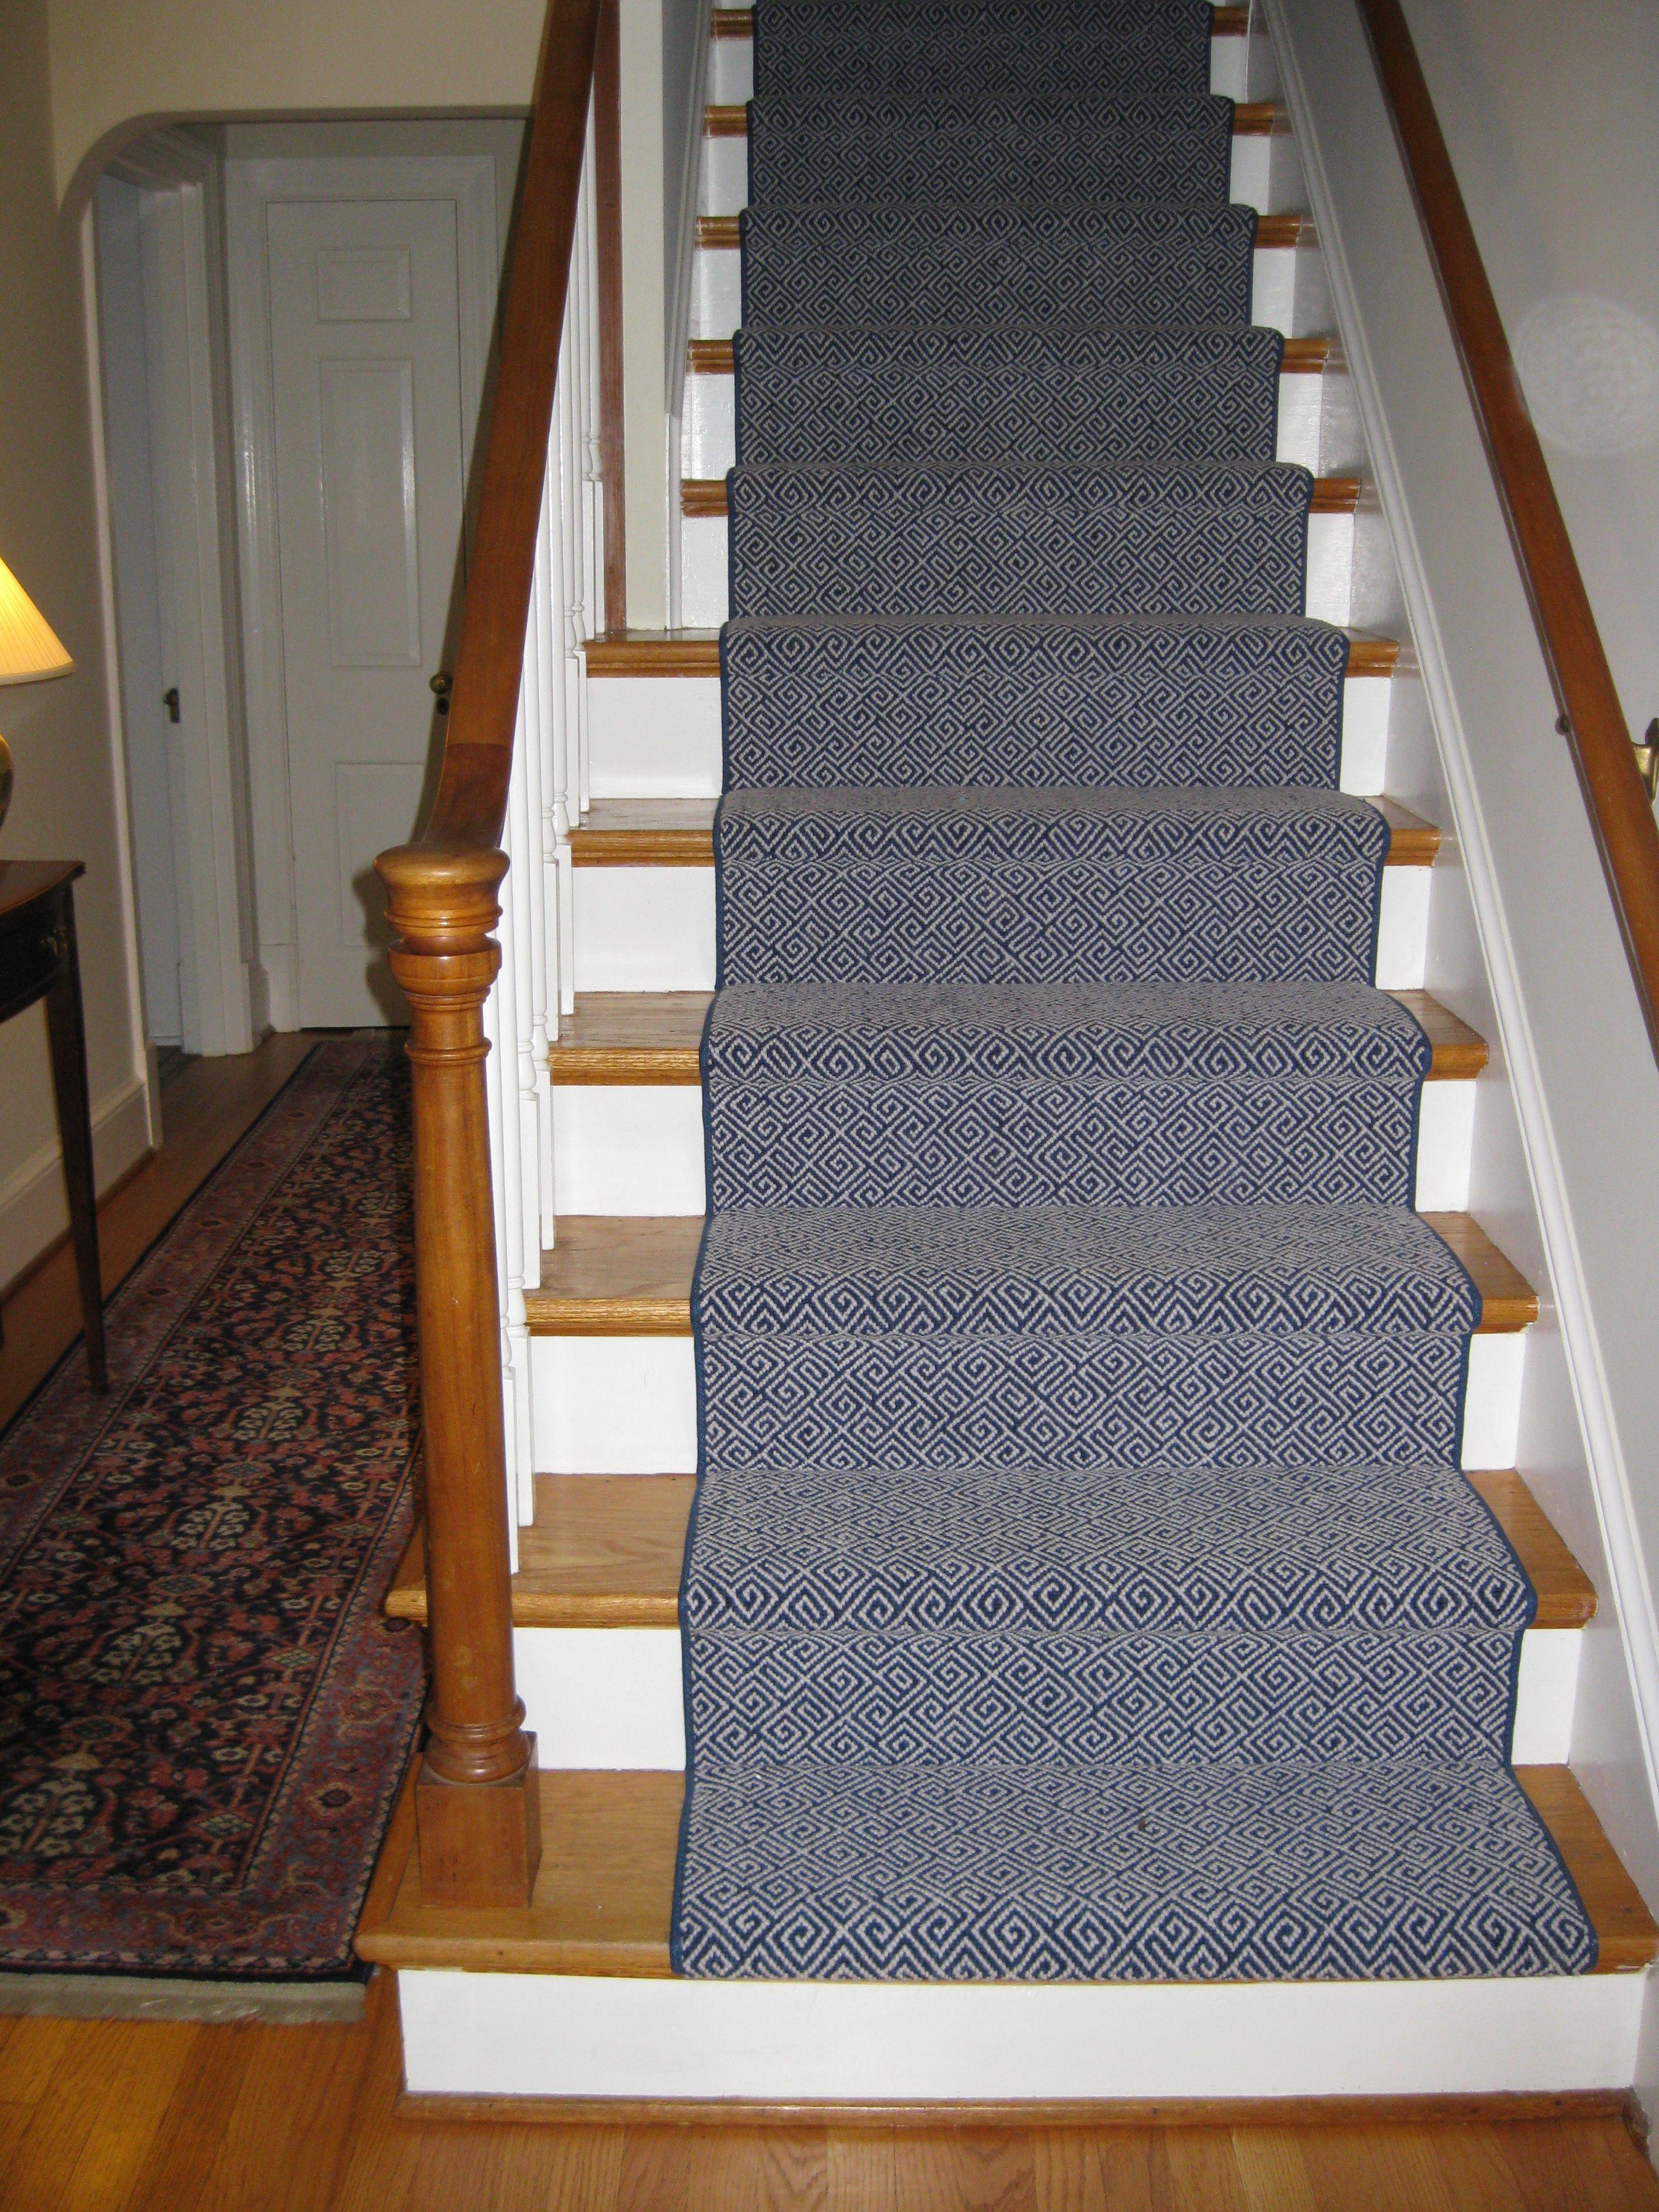 Best Stair Runners Stair Rugs Stairs Carpet Stairs 400 x 300